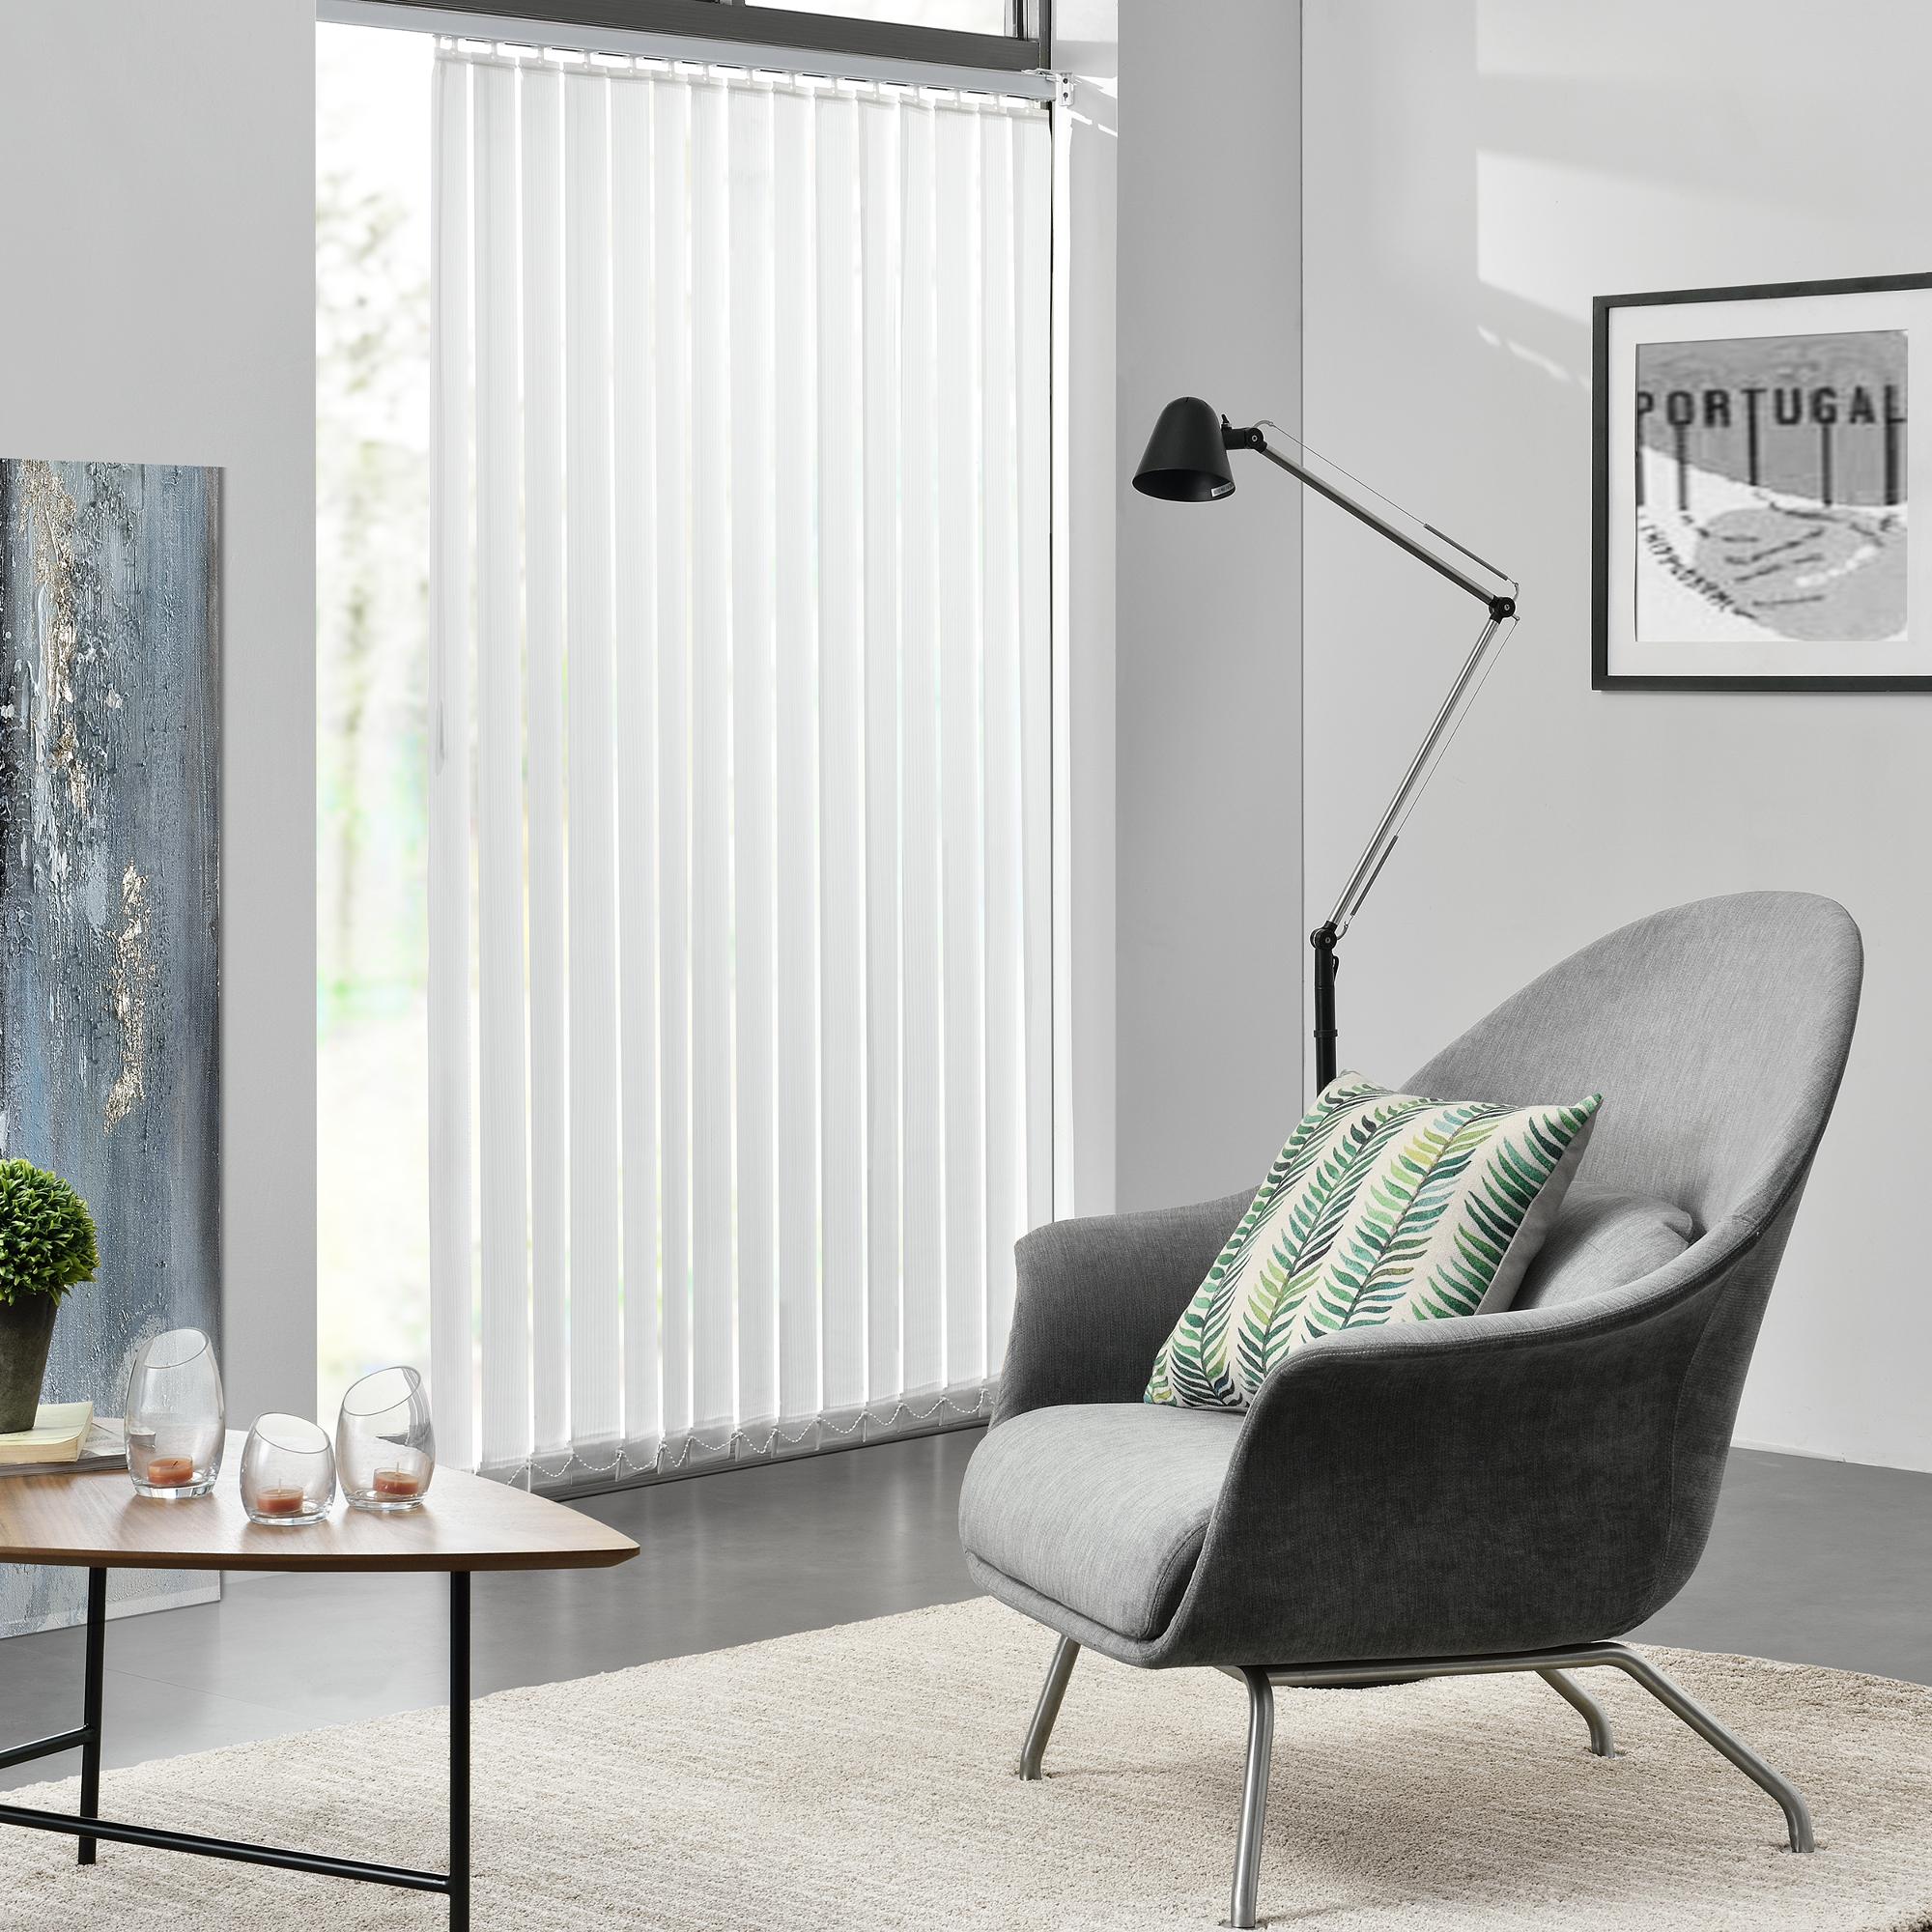 vertikal gardinen cool with vertikal gardinen full size of fenster mode berraschung kmwfaz. Black Bedroom Furniture Sets. Home Design Ideas